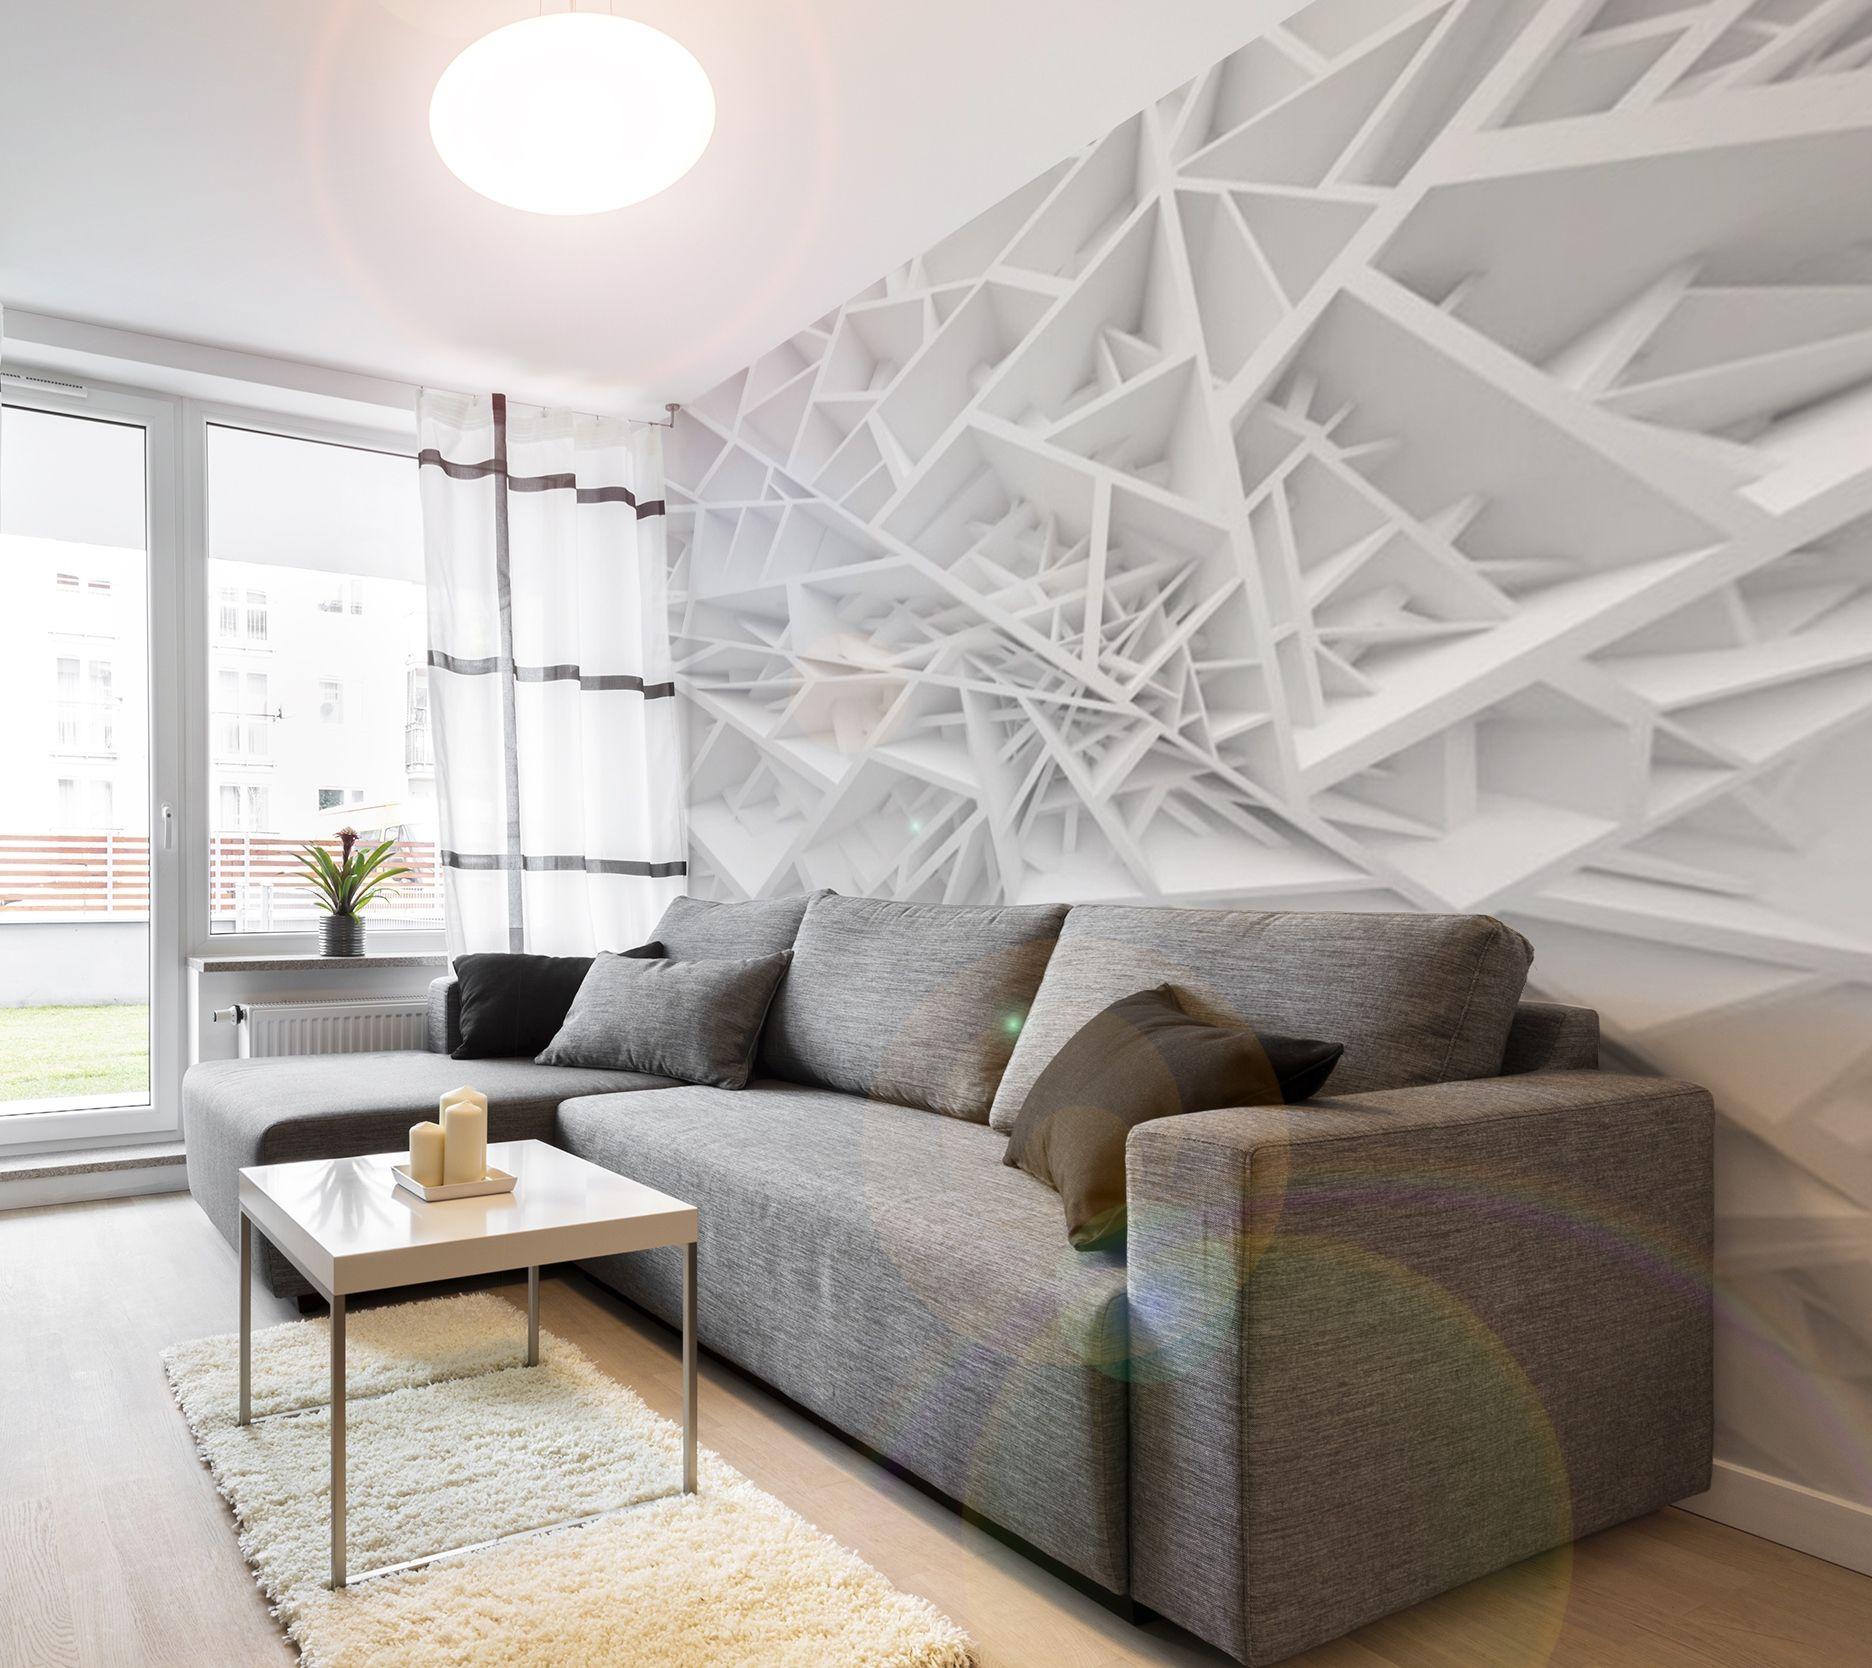 Best Photo Wallpaper White Spider S Web Home Decor Living 640 x 480